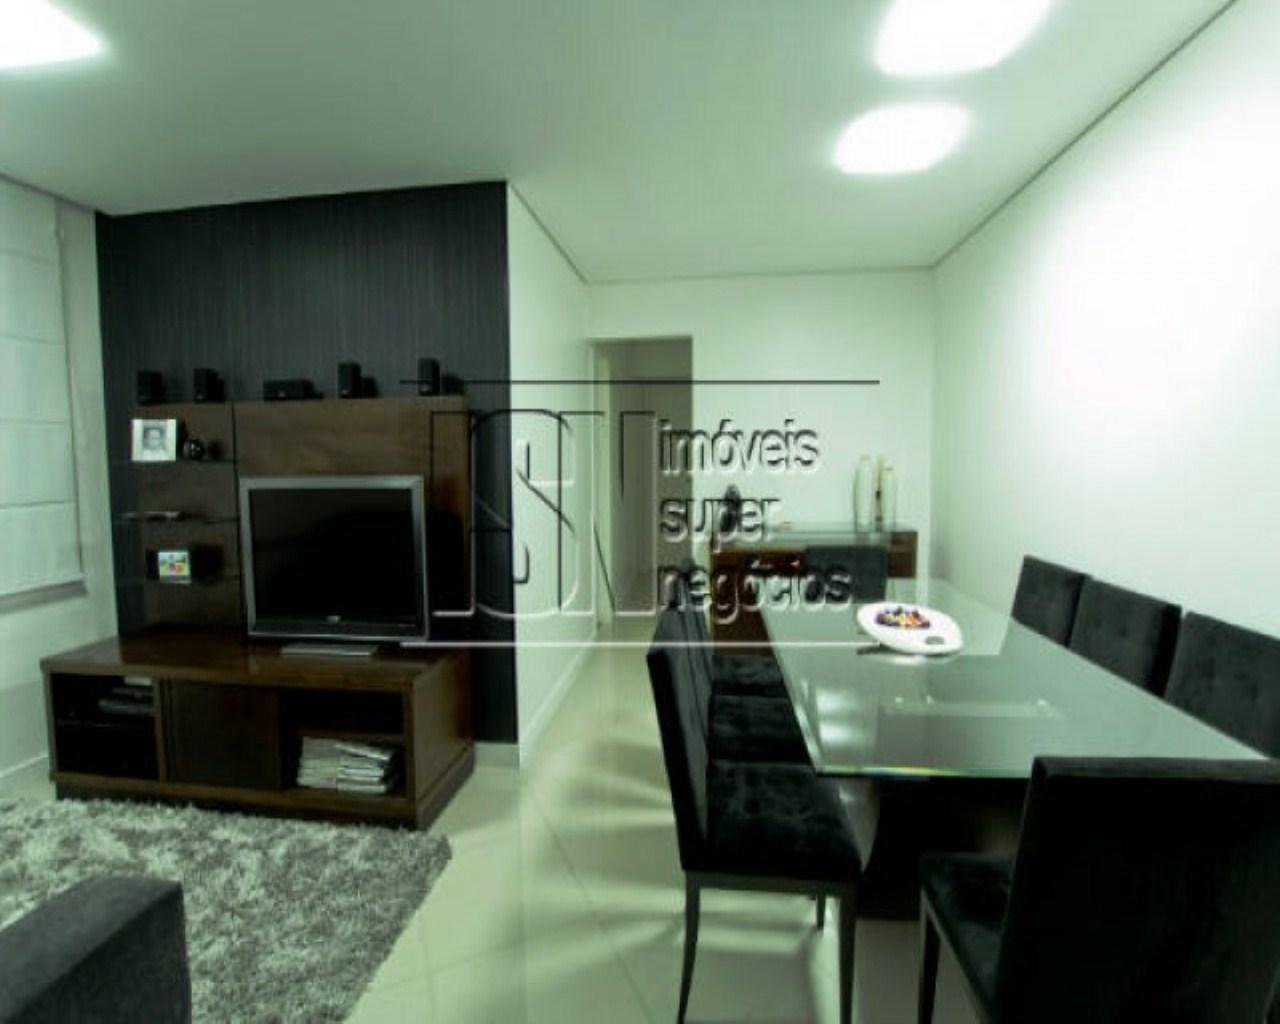 apartamento, vila ol& 237 mpia, s& 227 o paulo sp, 95 m2 - local do imovel classificados